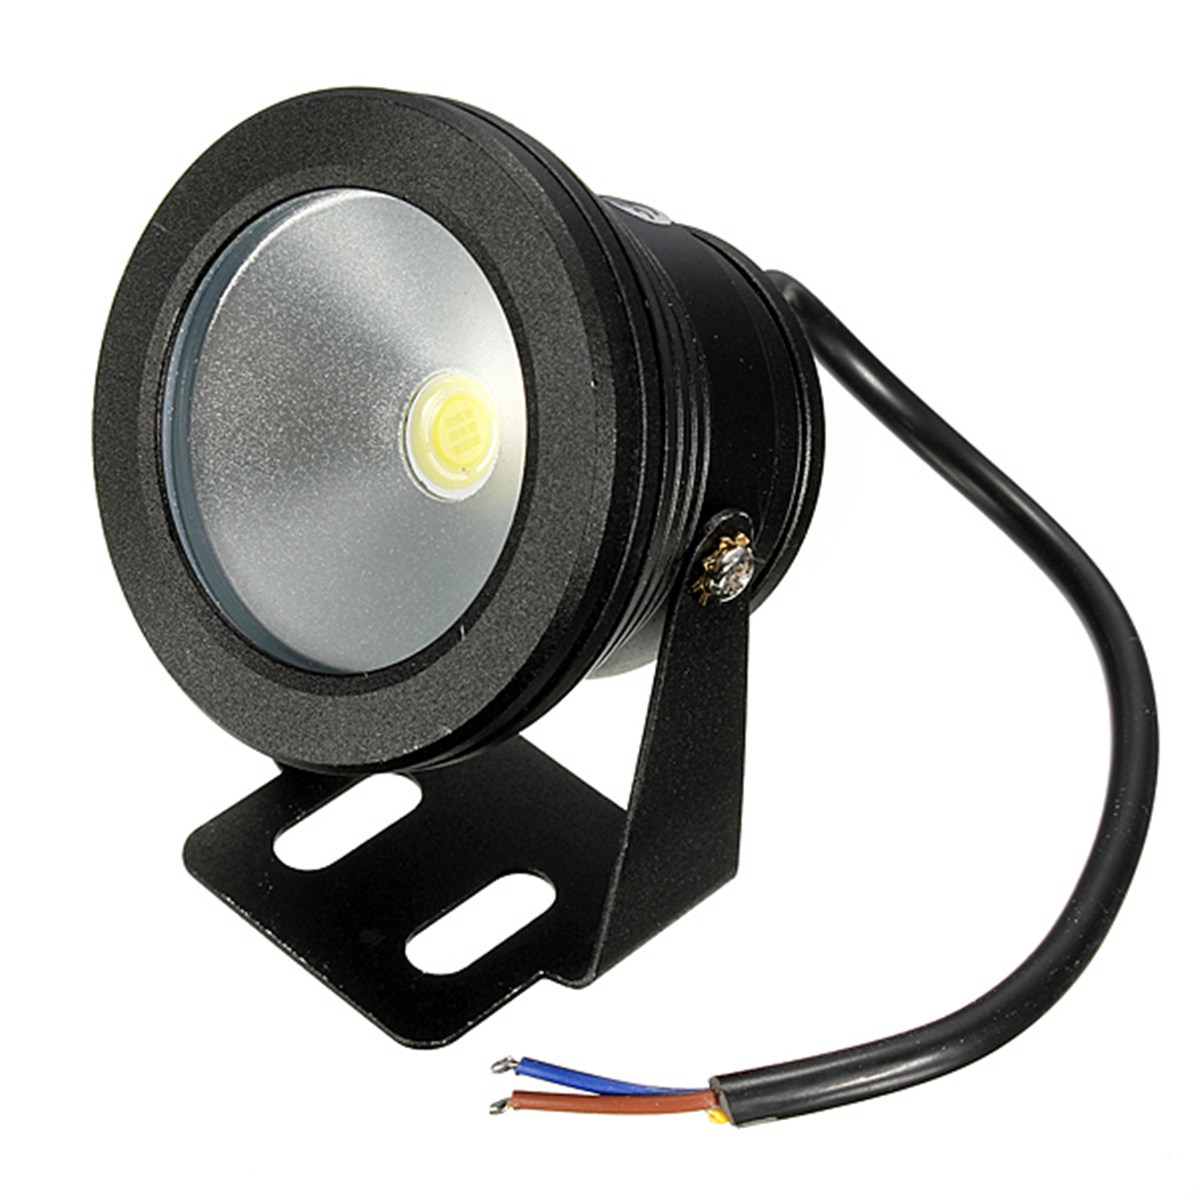 Mising 10W Underwater LED Flood Wash Pool Waterproof Light Spot Lamp 12V Outdoor Super Bright Aquarium Fish Tank Light